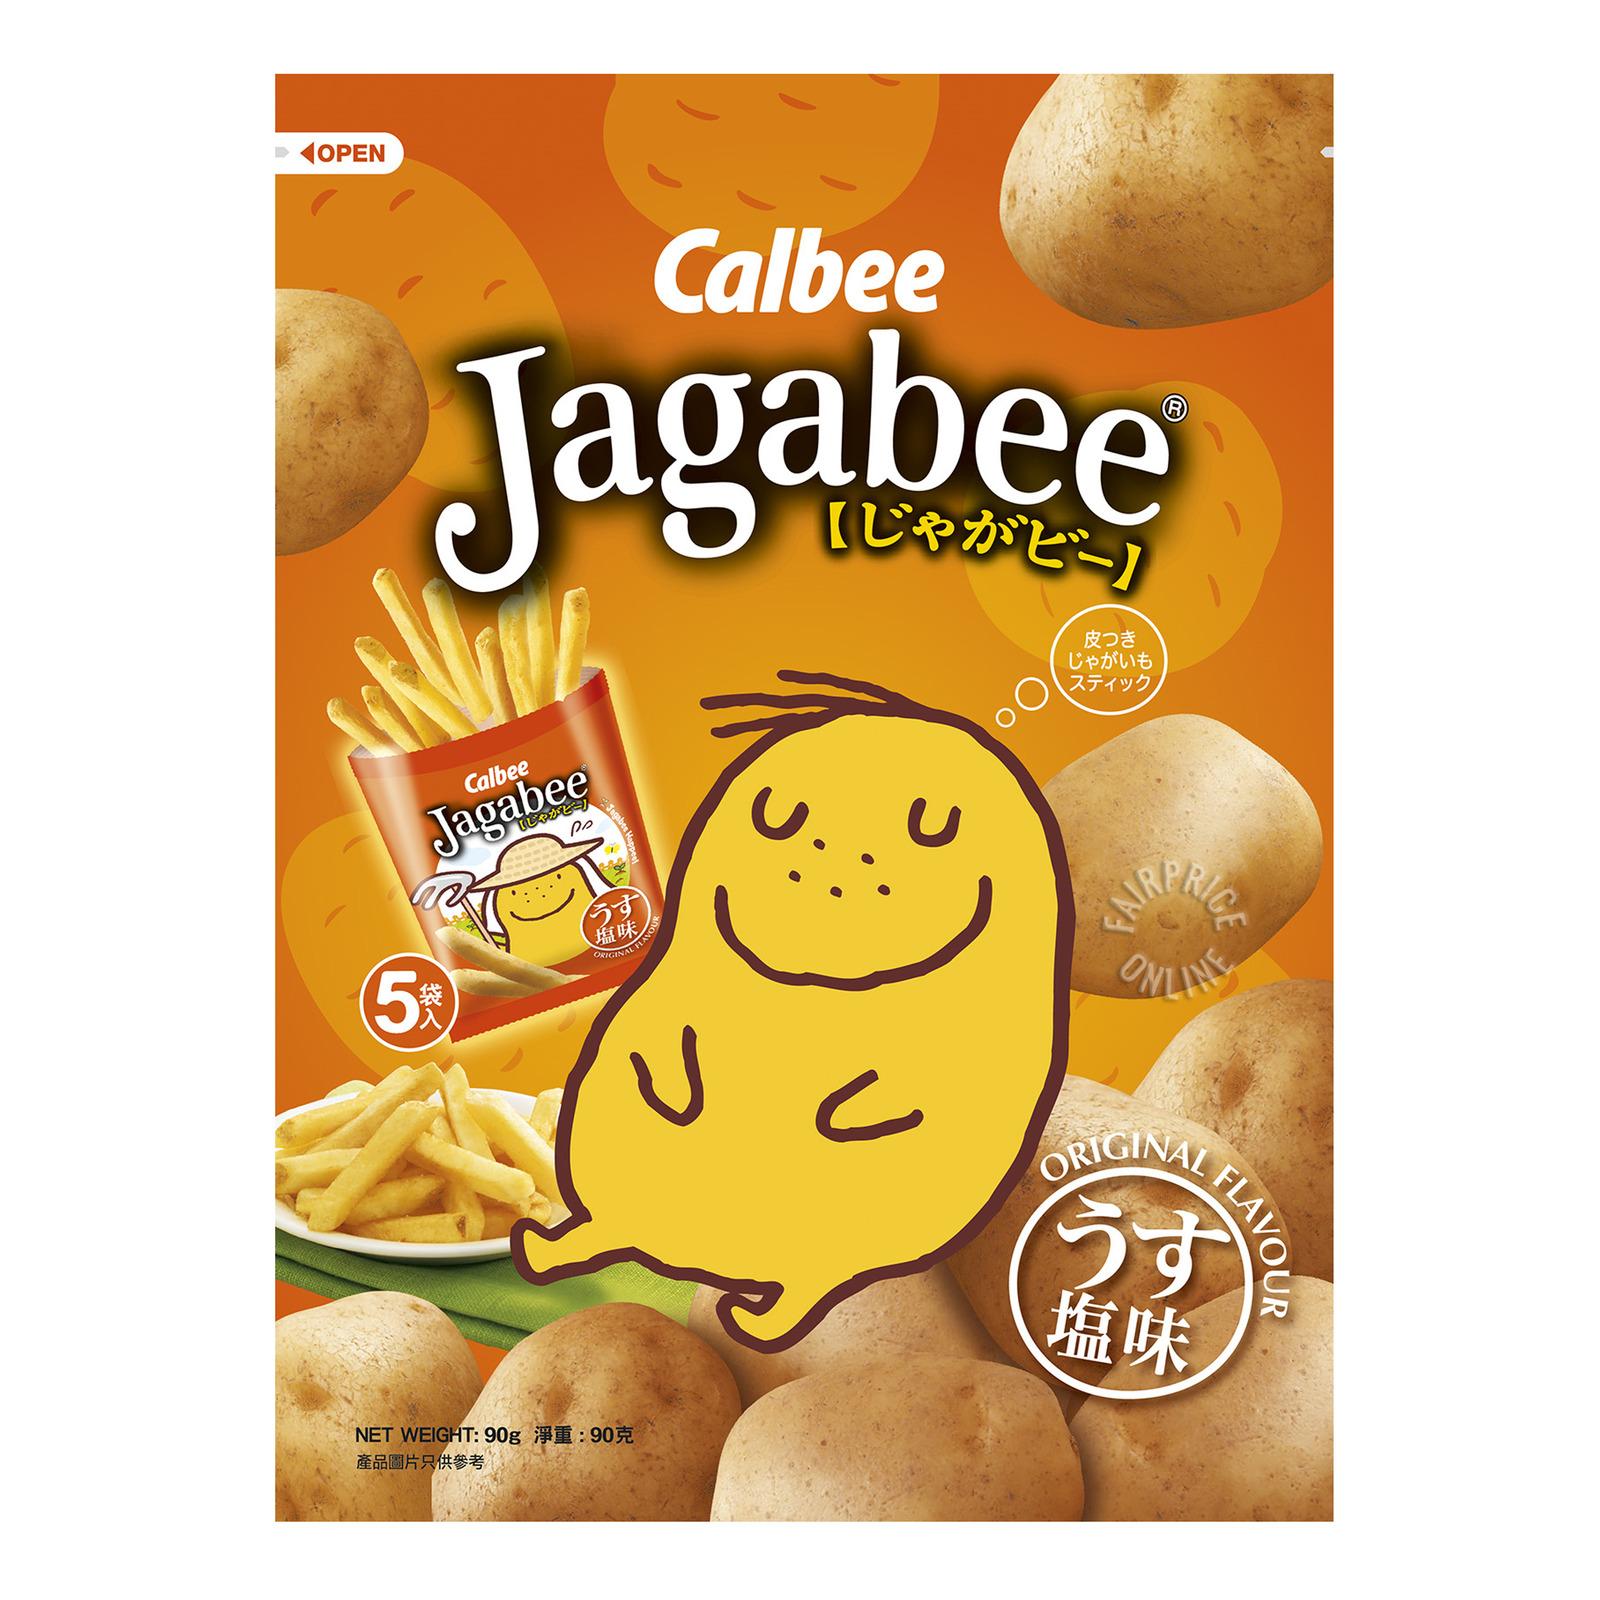 Calbee Jagabee Potato Sticks - Original